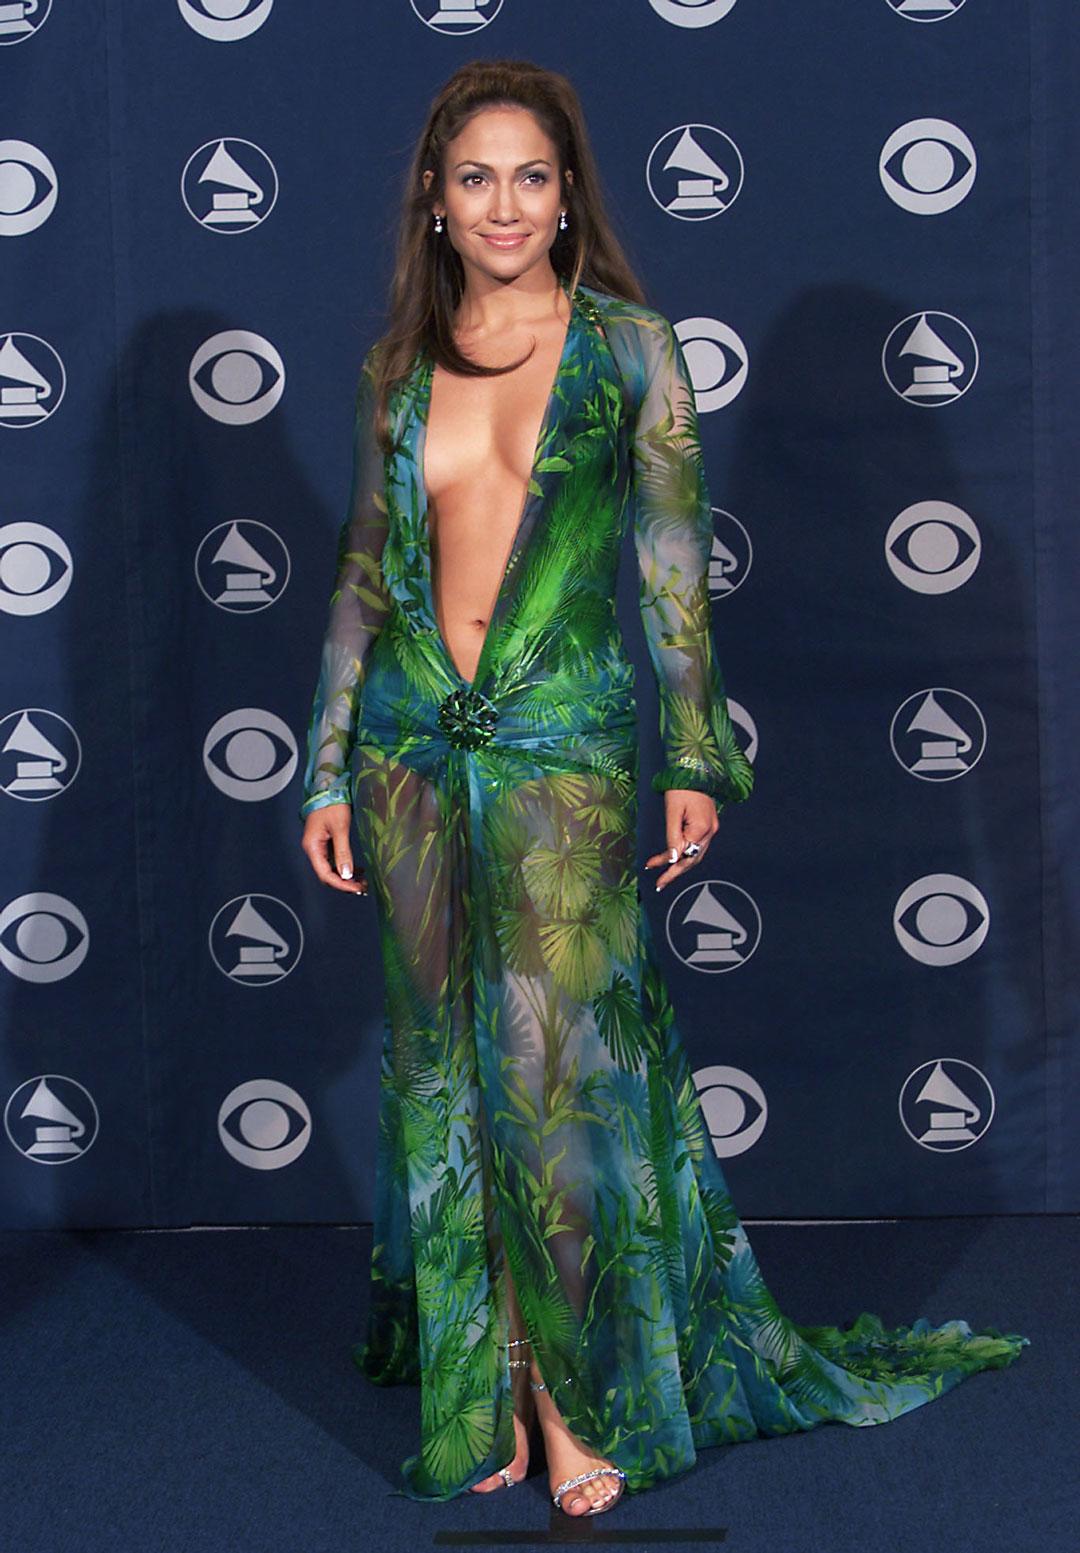 http://4.bp.blogspot.com/-jnA8LwRRAKw/URkDv6mPFQI/AAAAAAAACnI/beEDGdxOptk/s1600/jennifer-lopez-grammy-dress-body.jpg